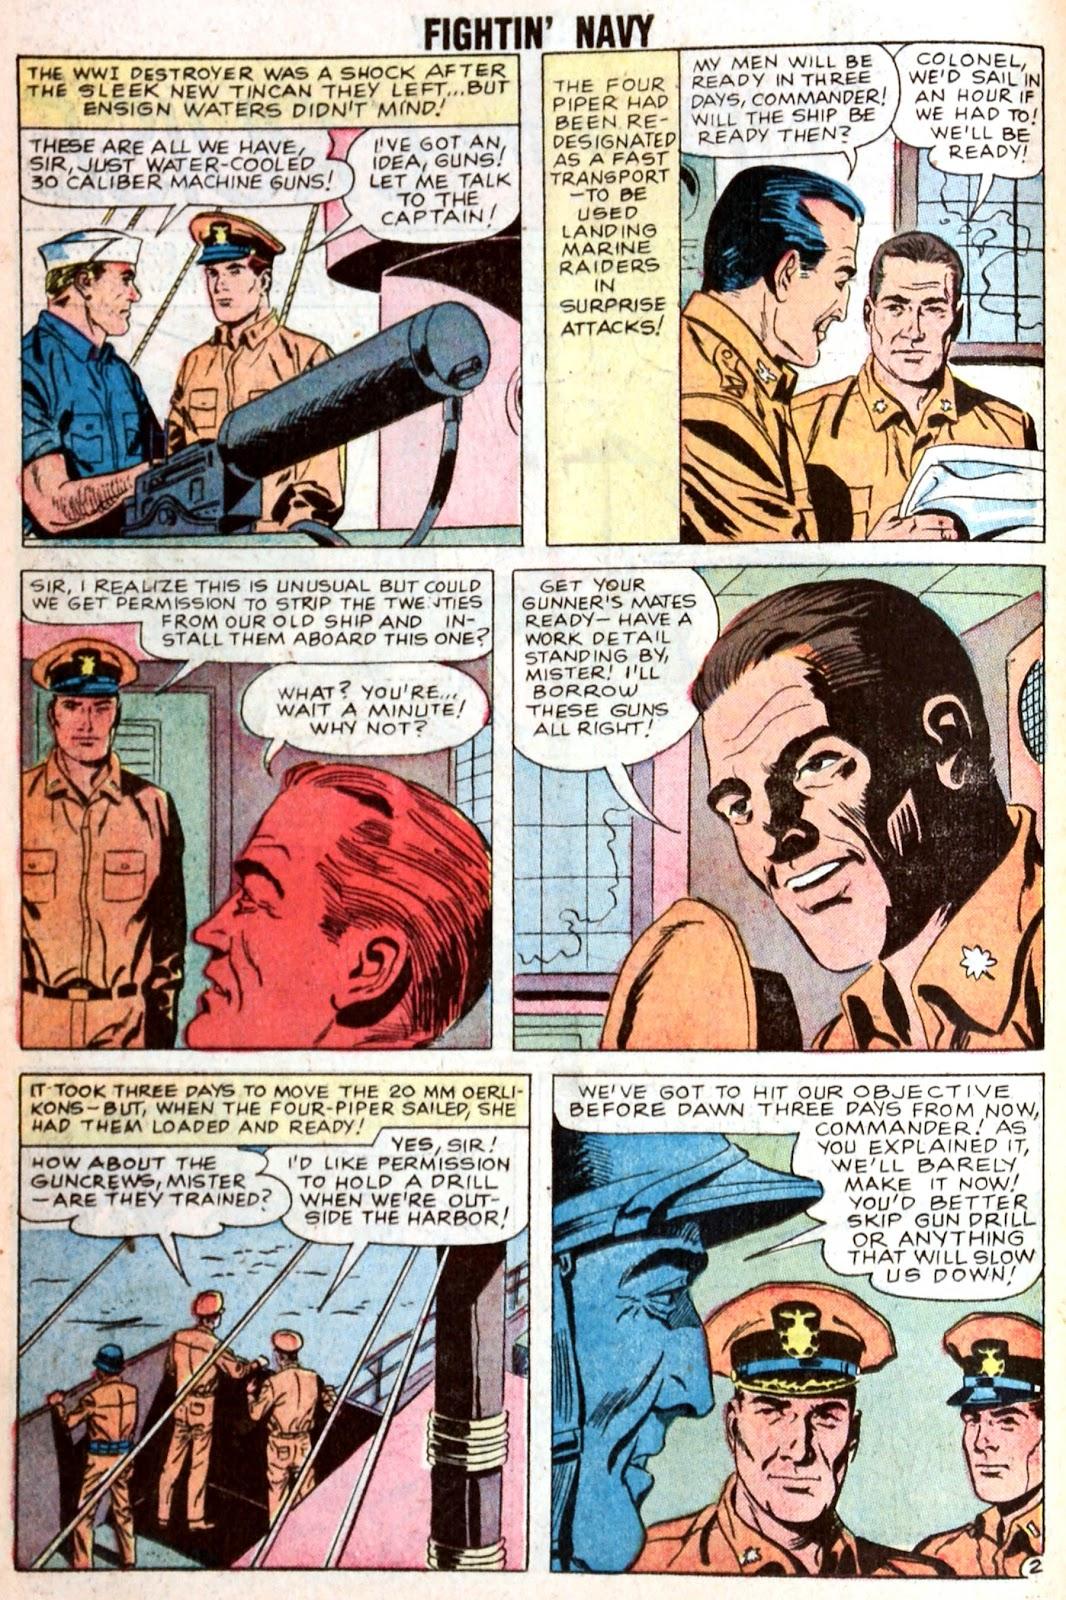 Read online Fightin' Navy comic -  Issue #85 - 14